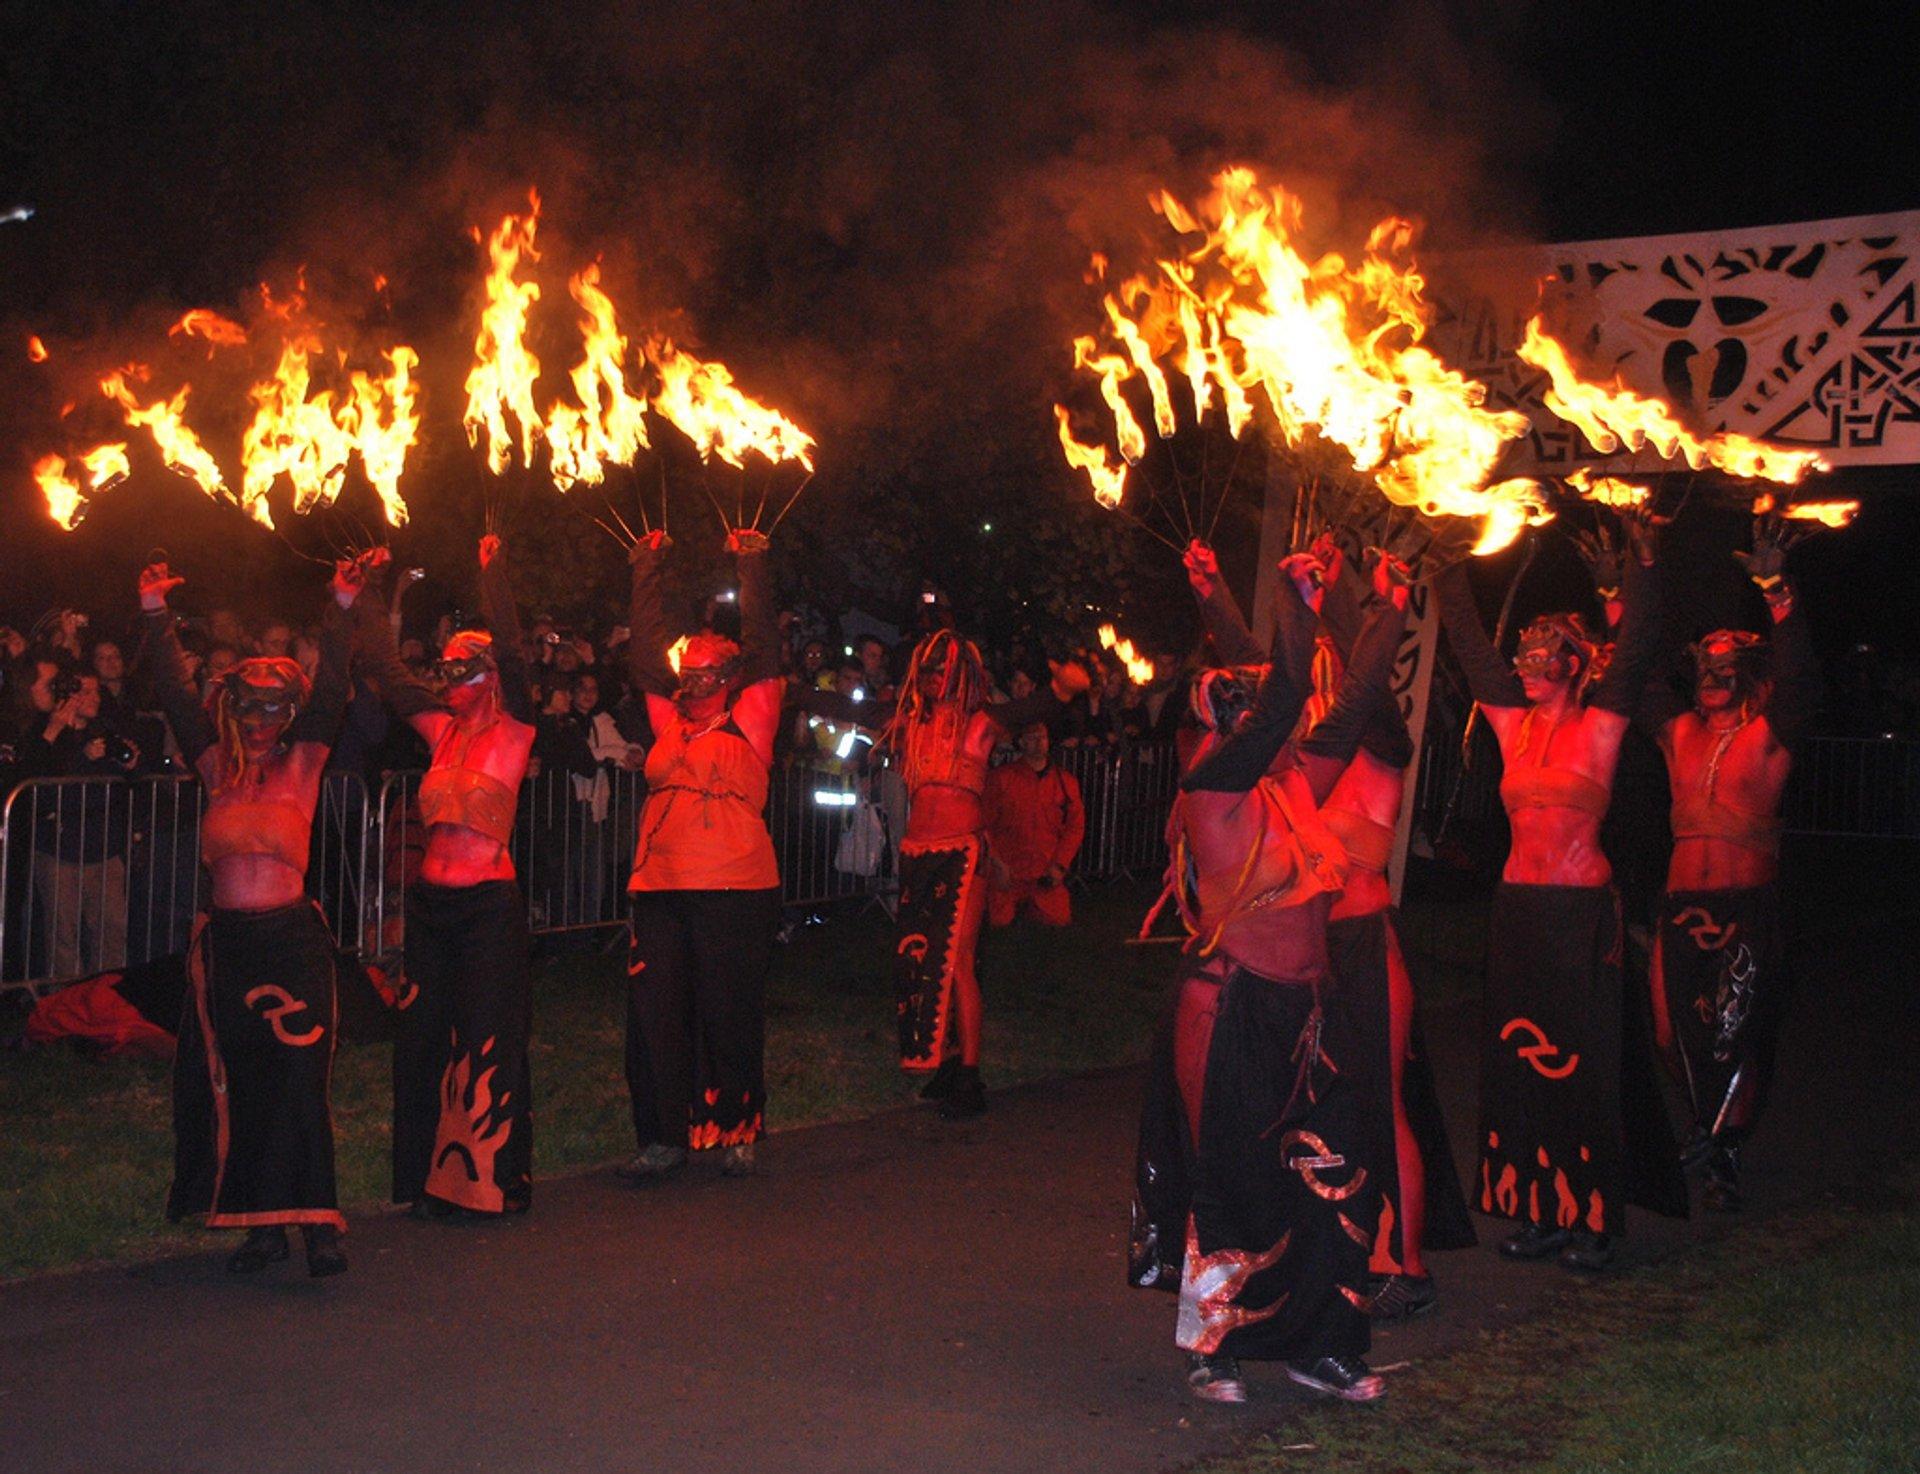 Beltane Fire Festival in Edinburgh 2020 - Best Time